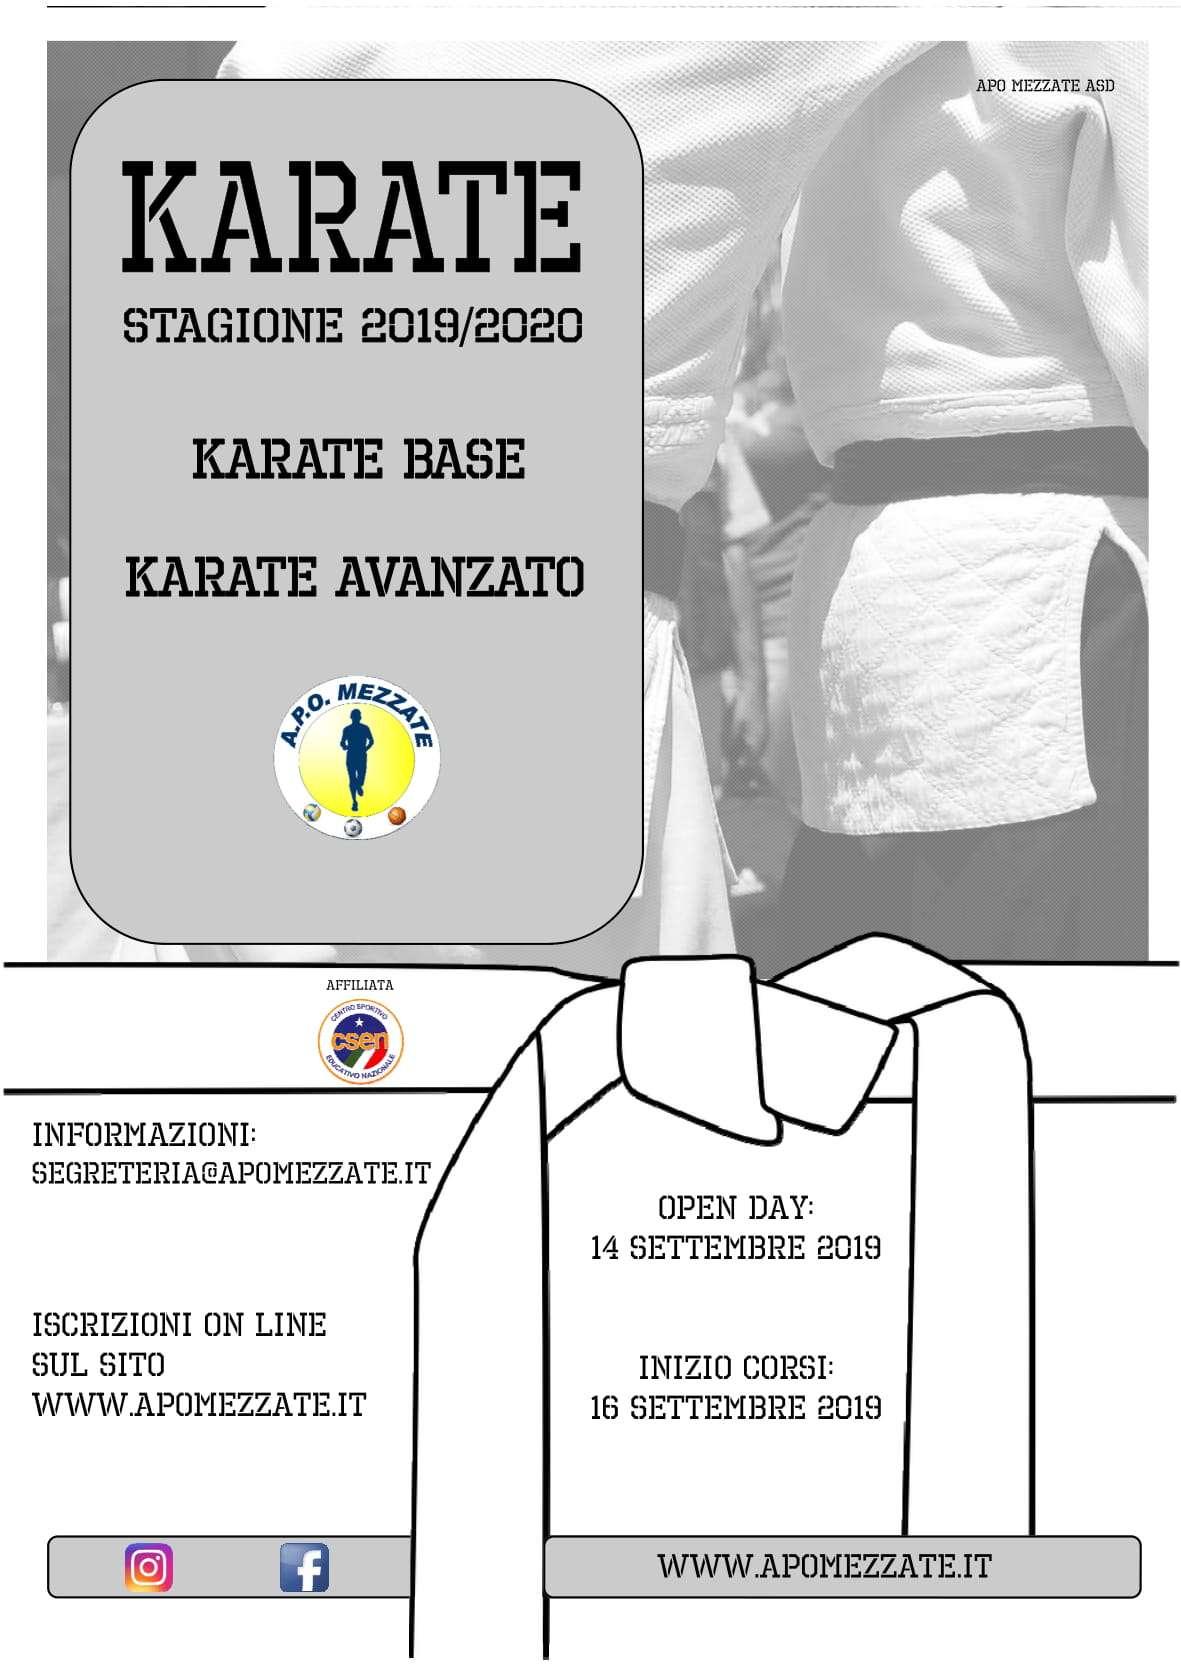 karate 1 - Scuola Materna Peschiera Borromeo